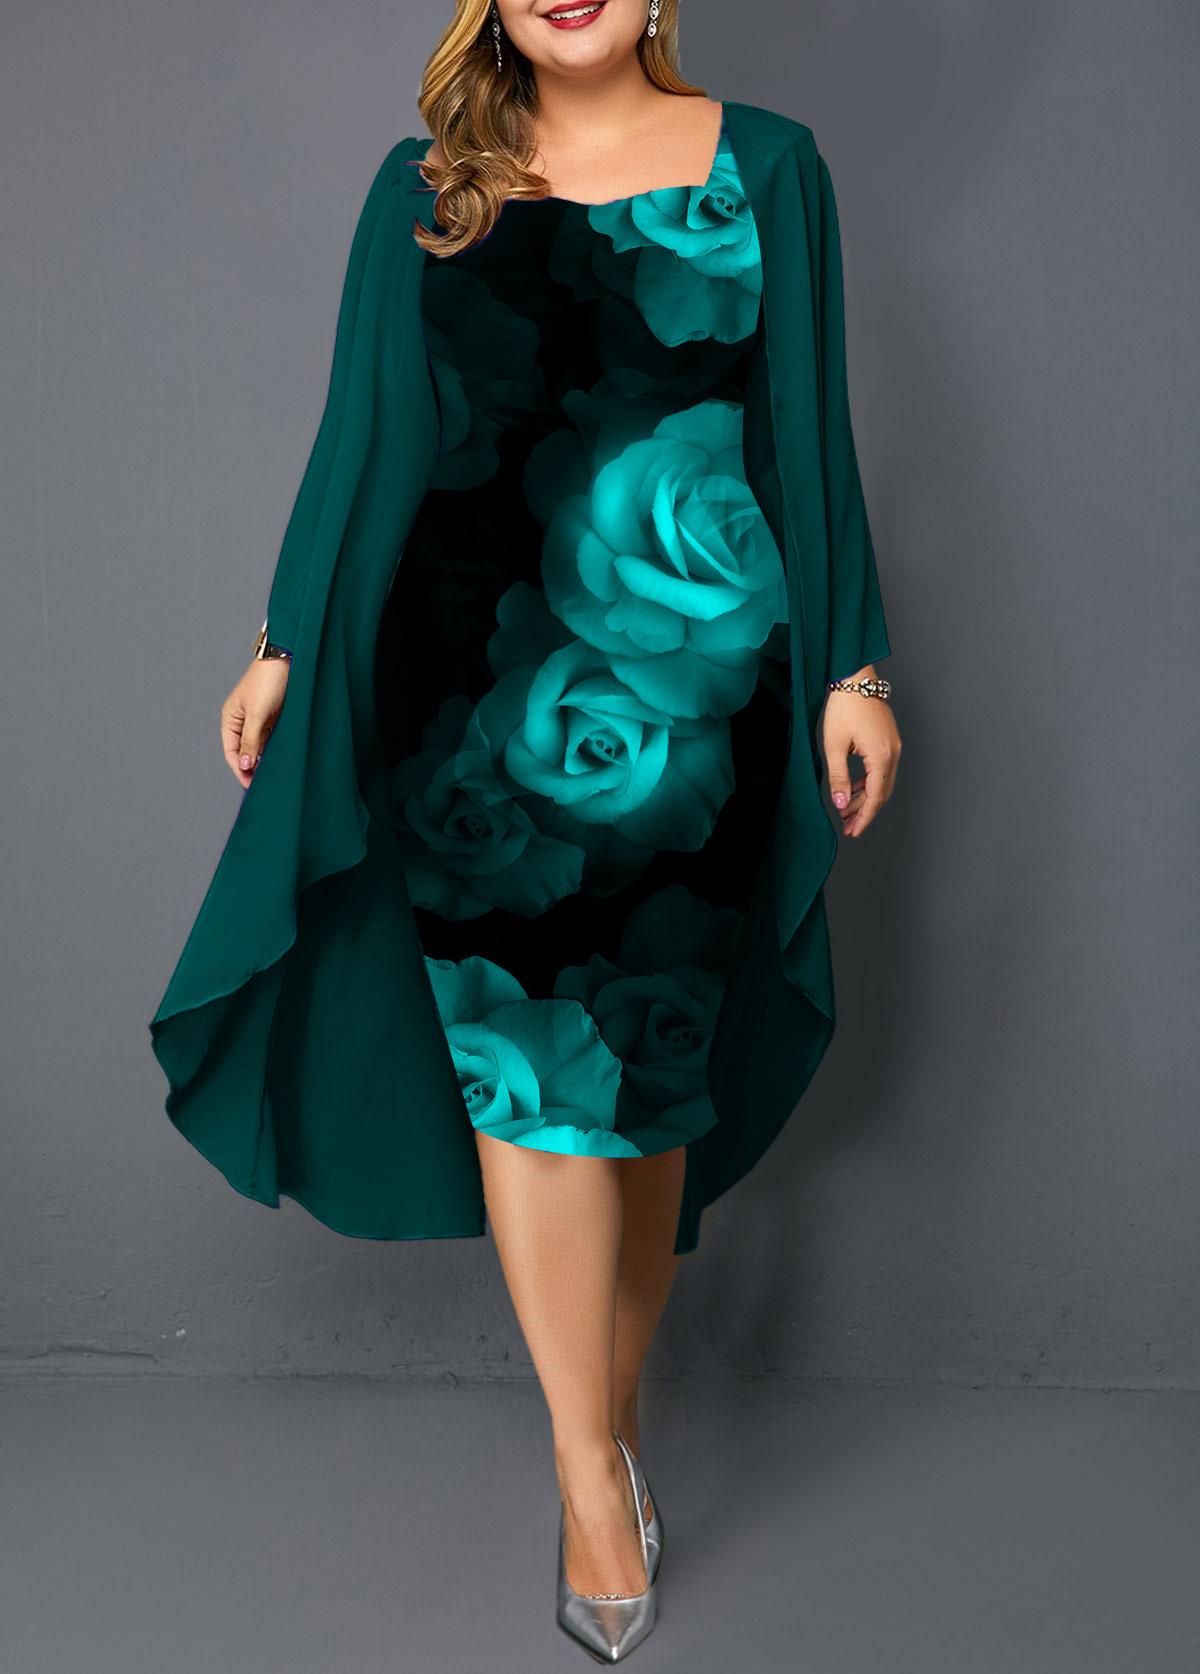 Plus Size Long Sleeve Chiffon Cardigan and Flower Print Dress